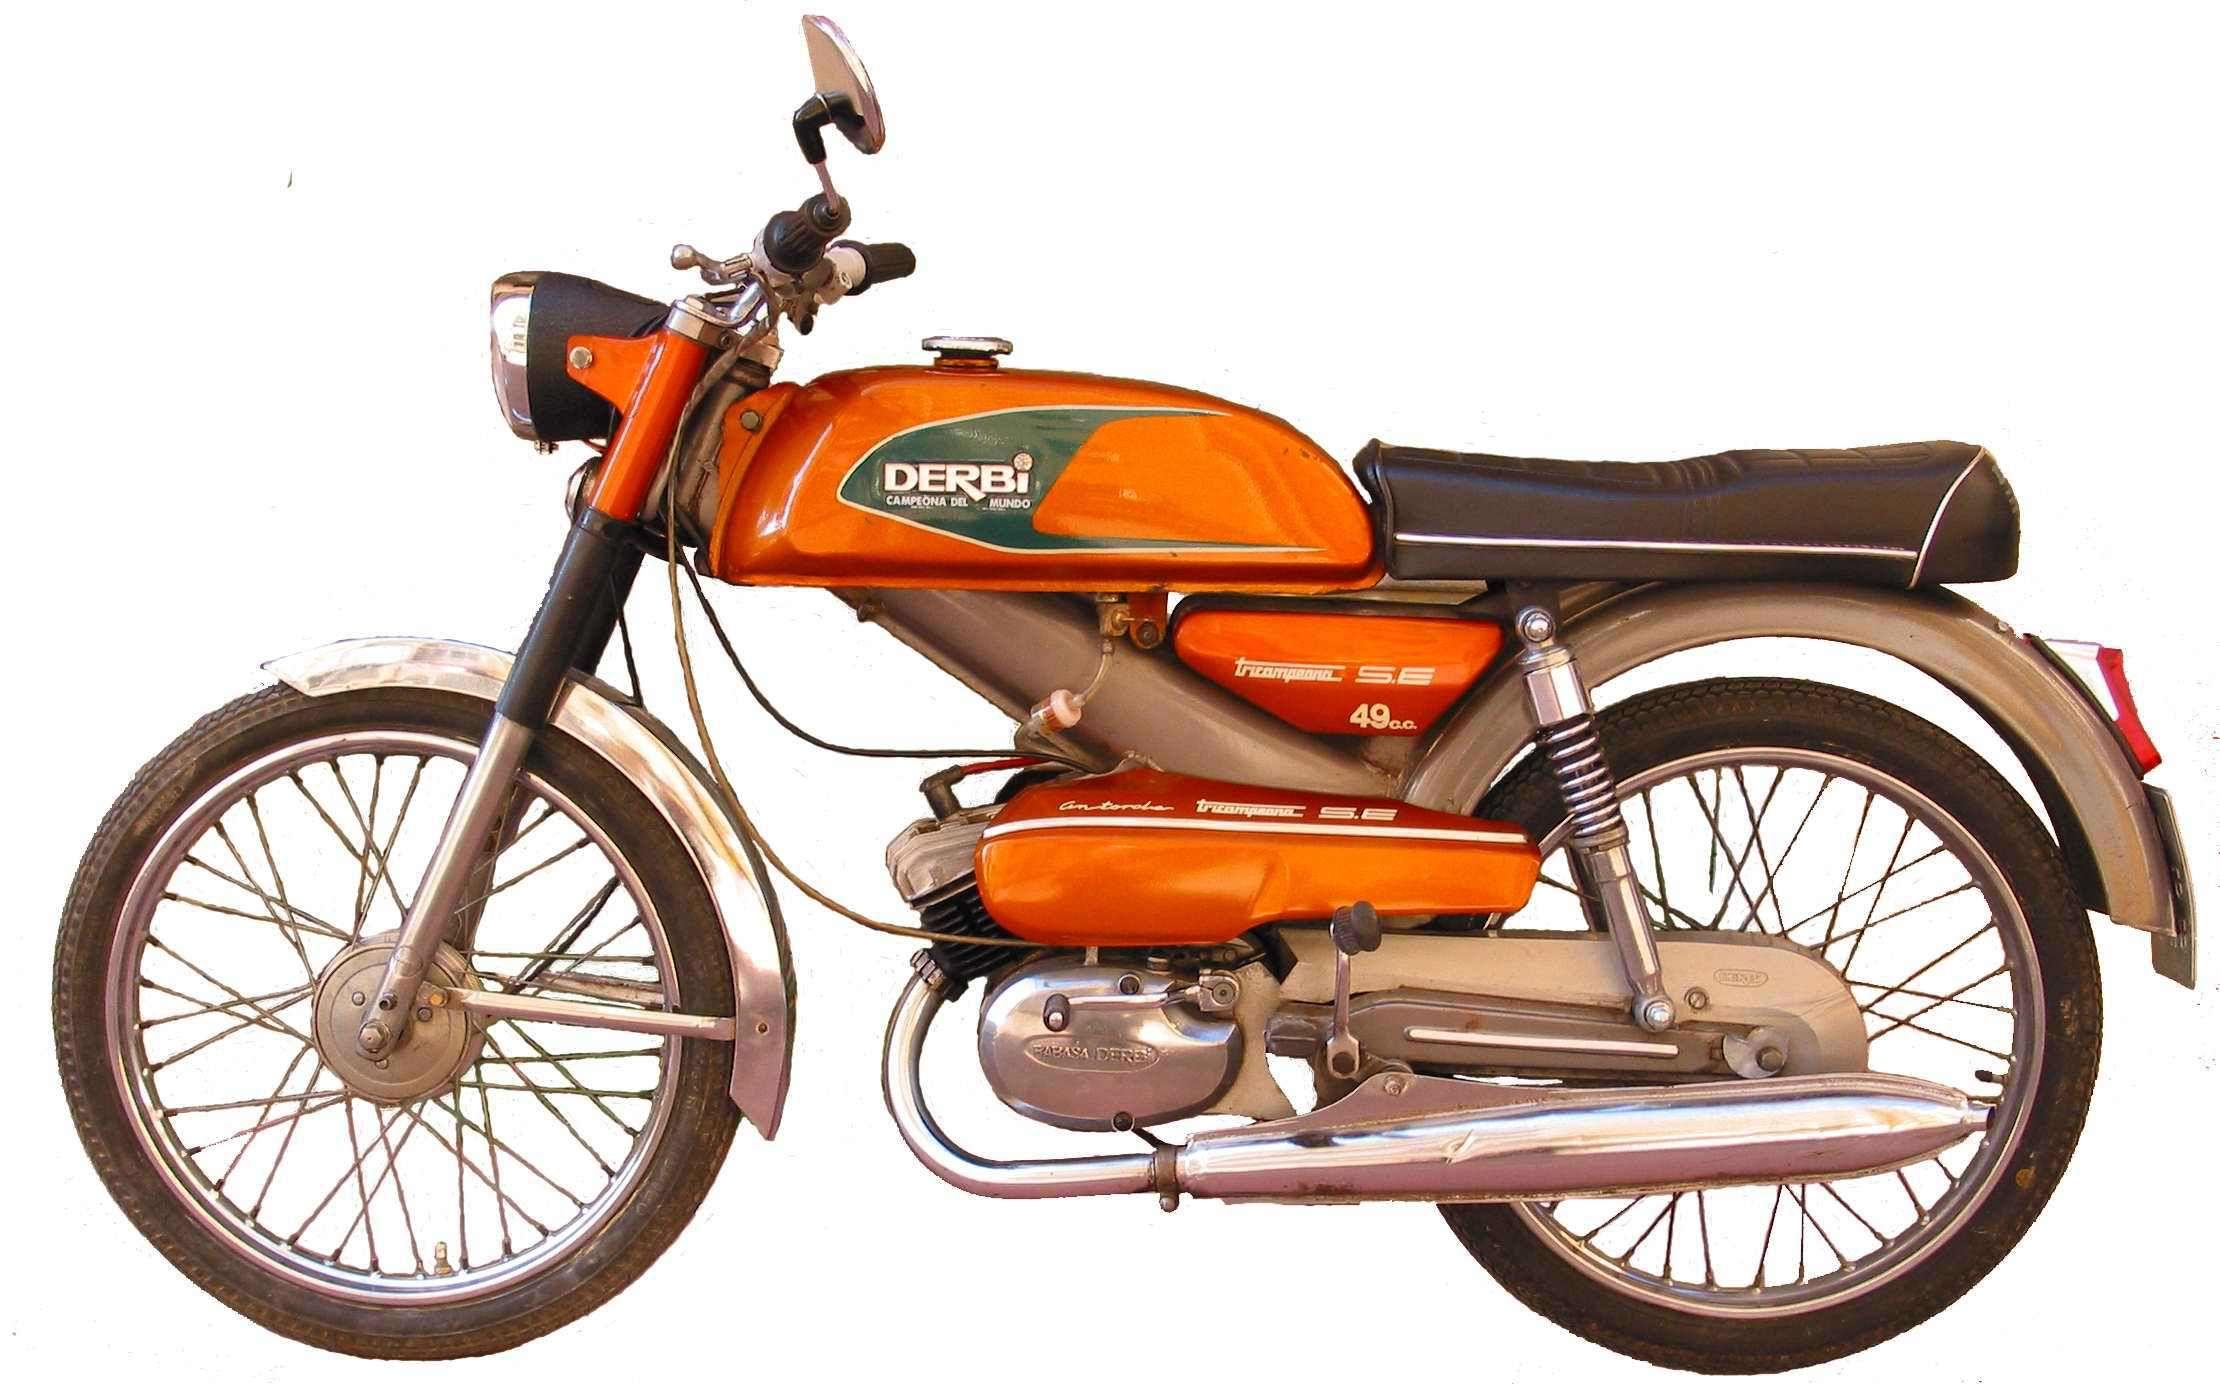 Resultado De Imagen De Derbi Motos Clasicas Motos Antiguas Motocicletas Antiguas